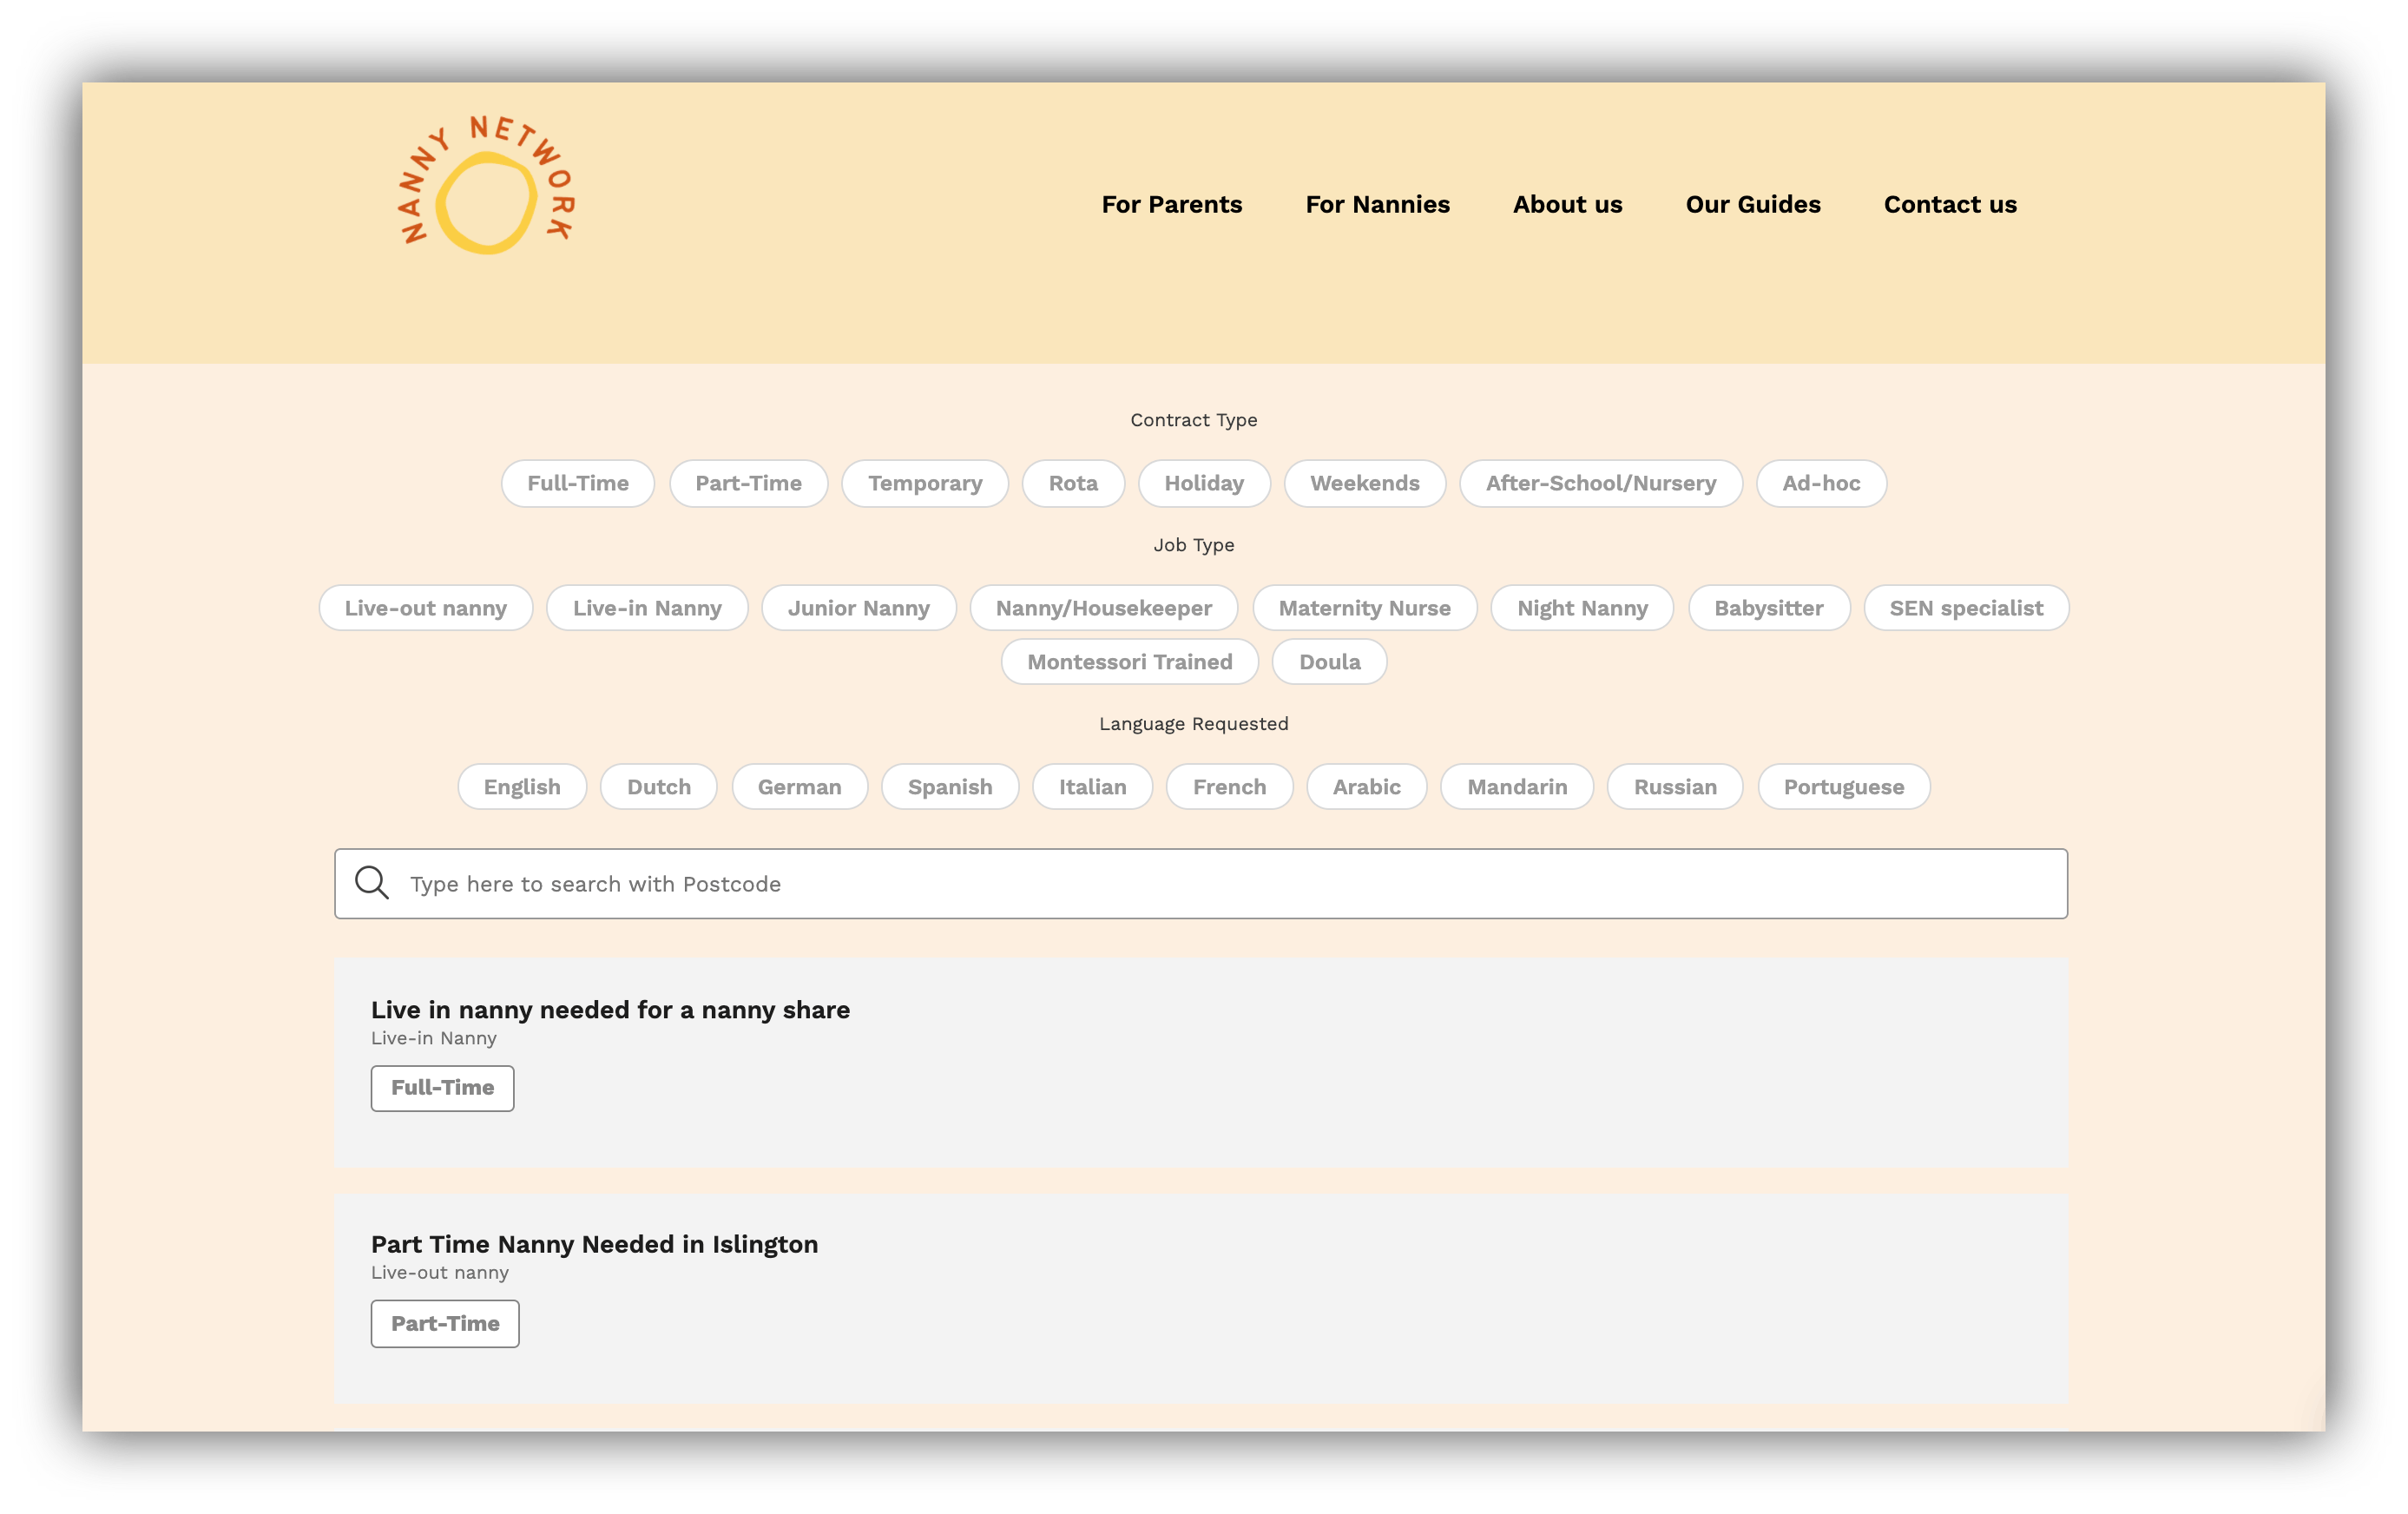 nanny network guides list